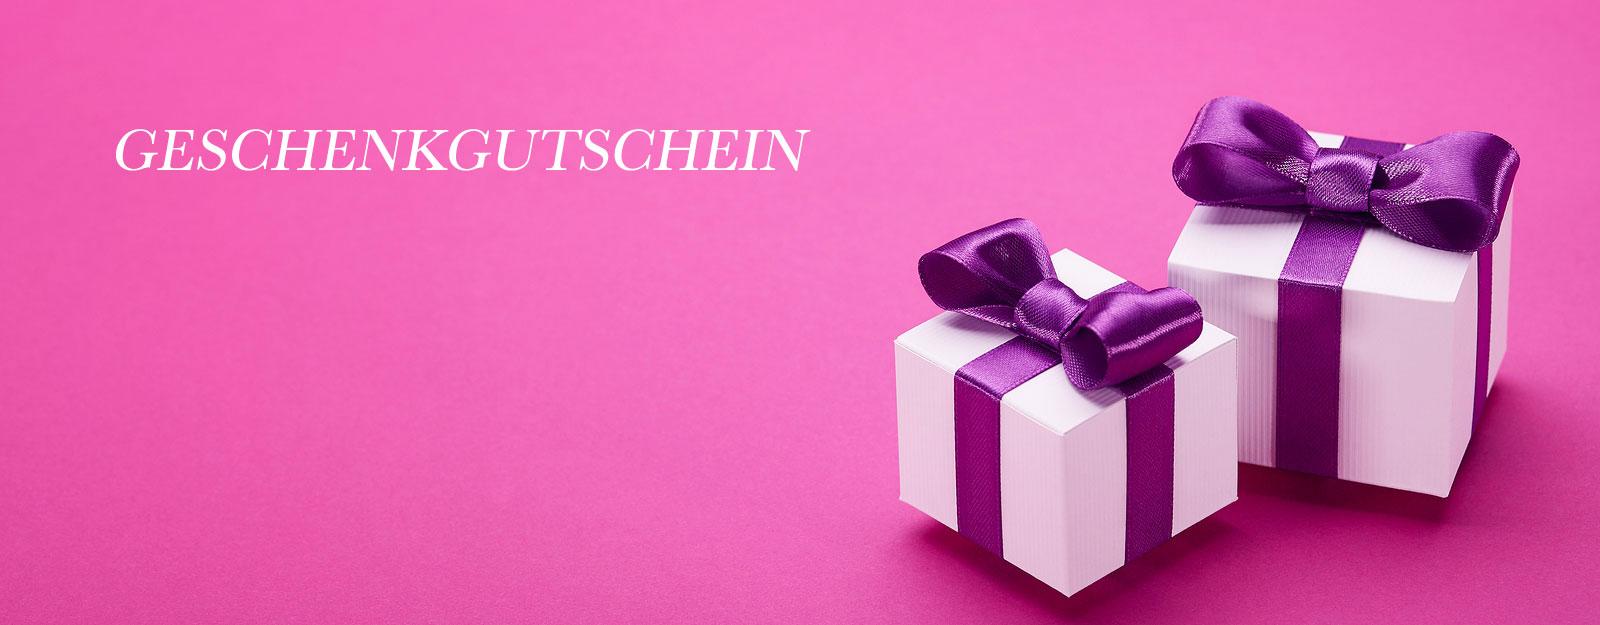 GESCHENKGUTSCHEIN_GIFTVOUCHER_DIAMONDSHOES-DE